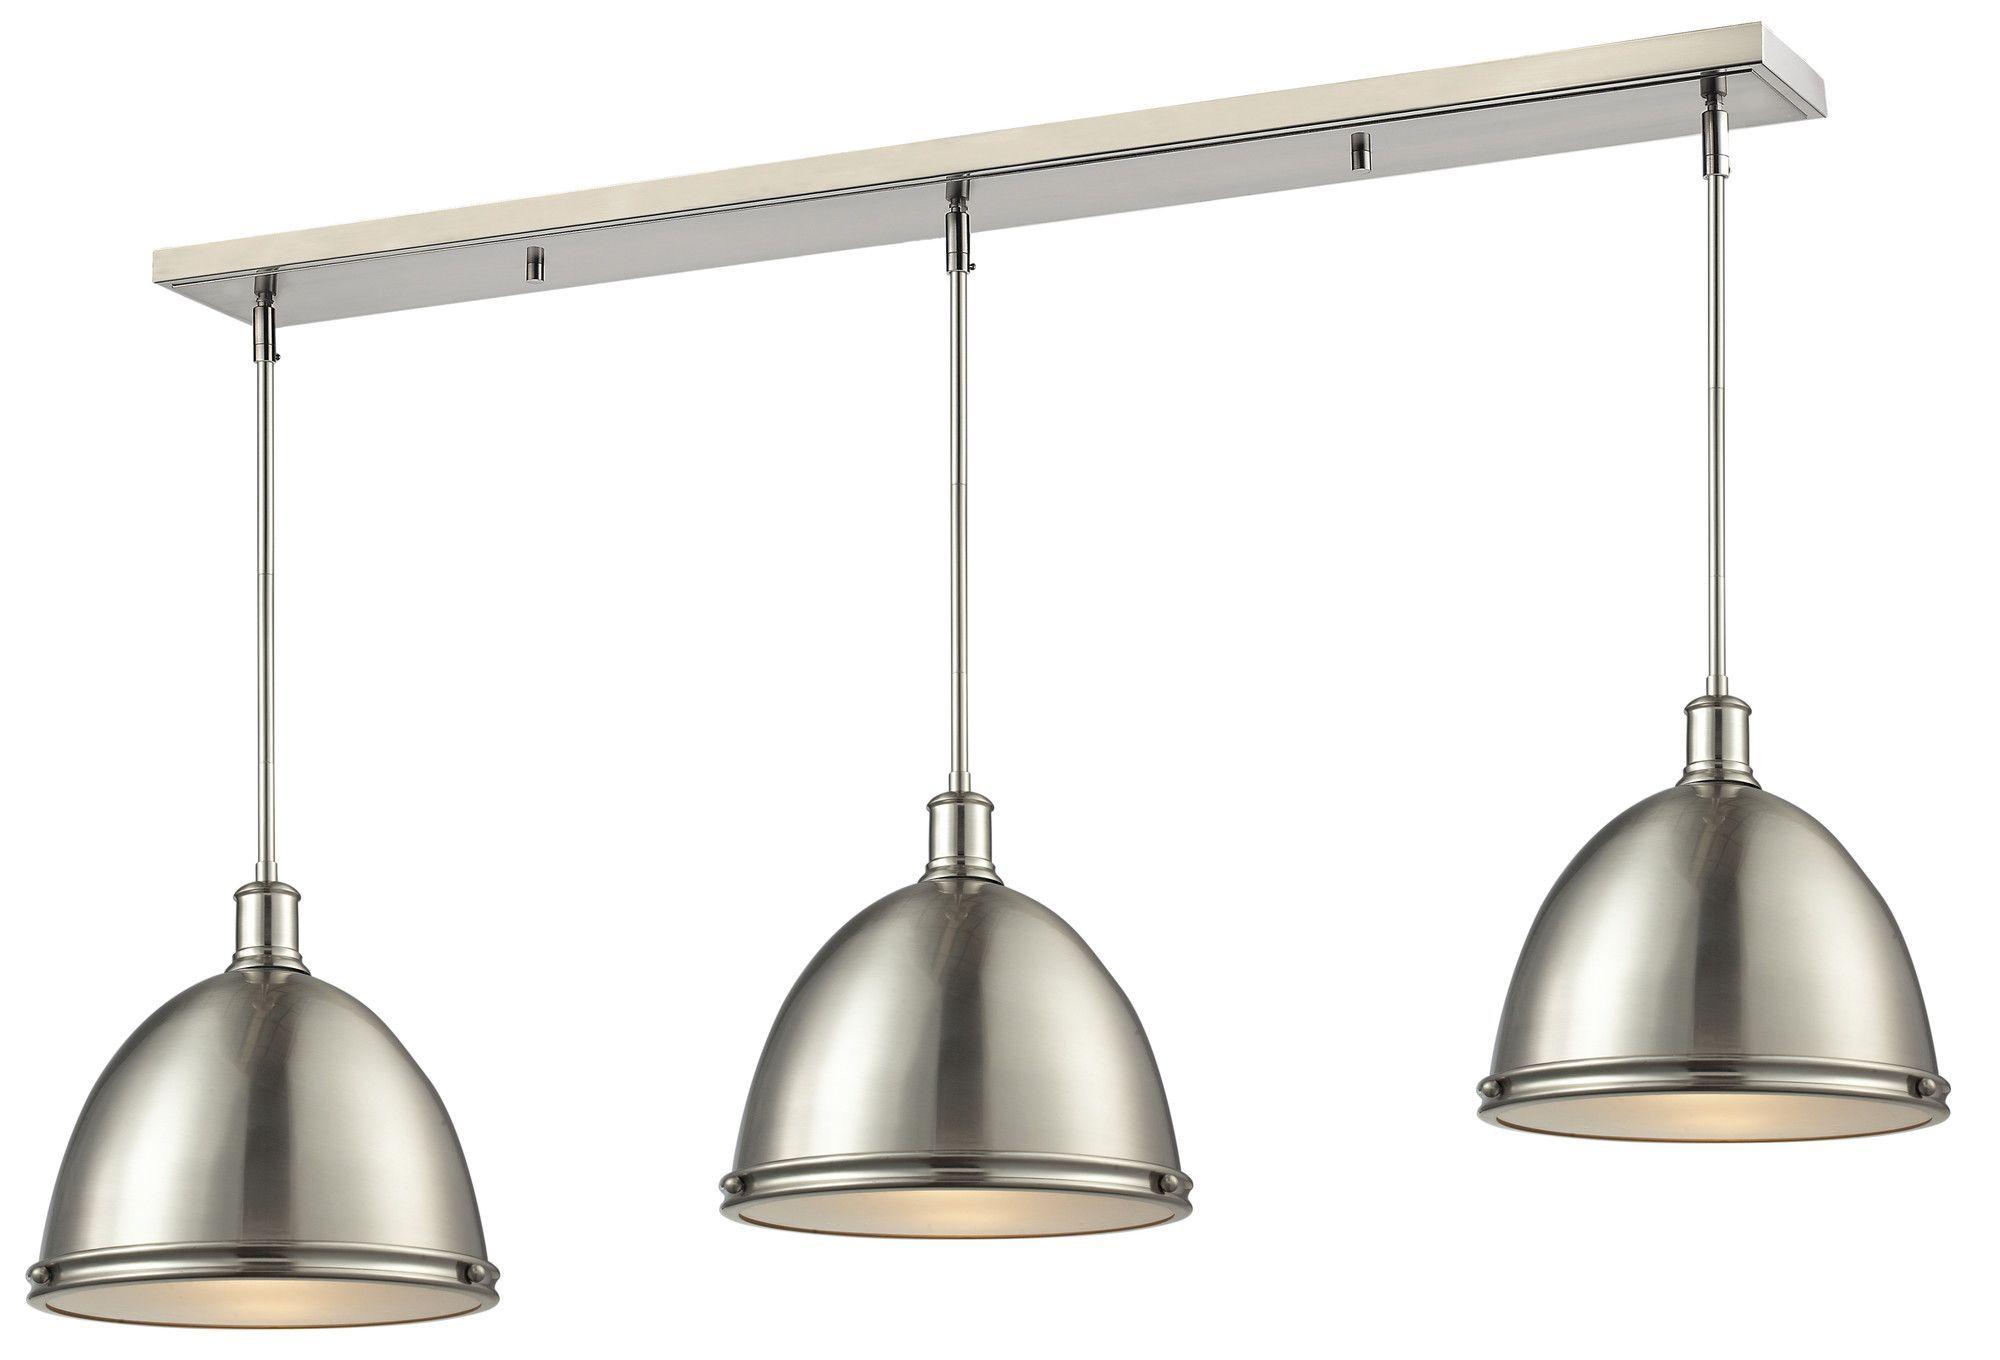 Mason 3 Light Billiard Light | Products | Pinterest | Billiard ...